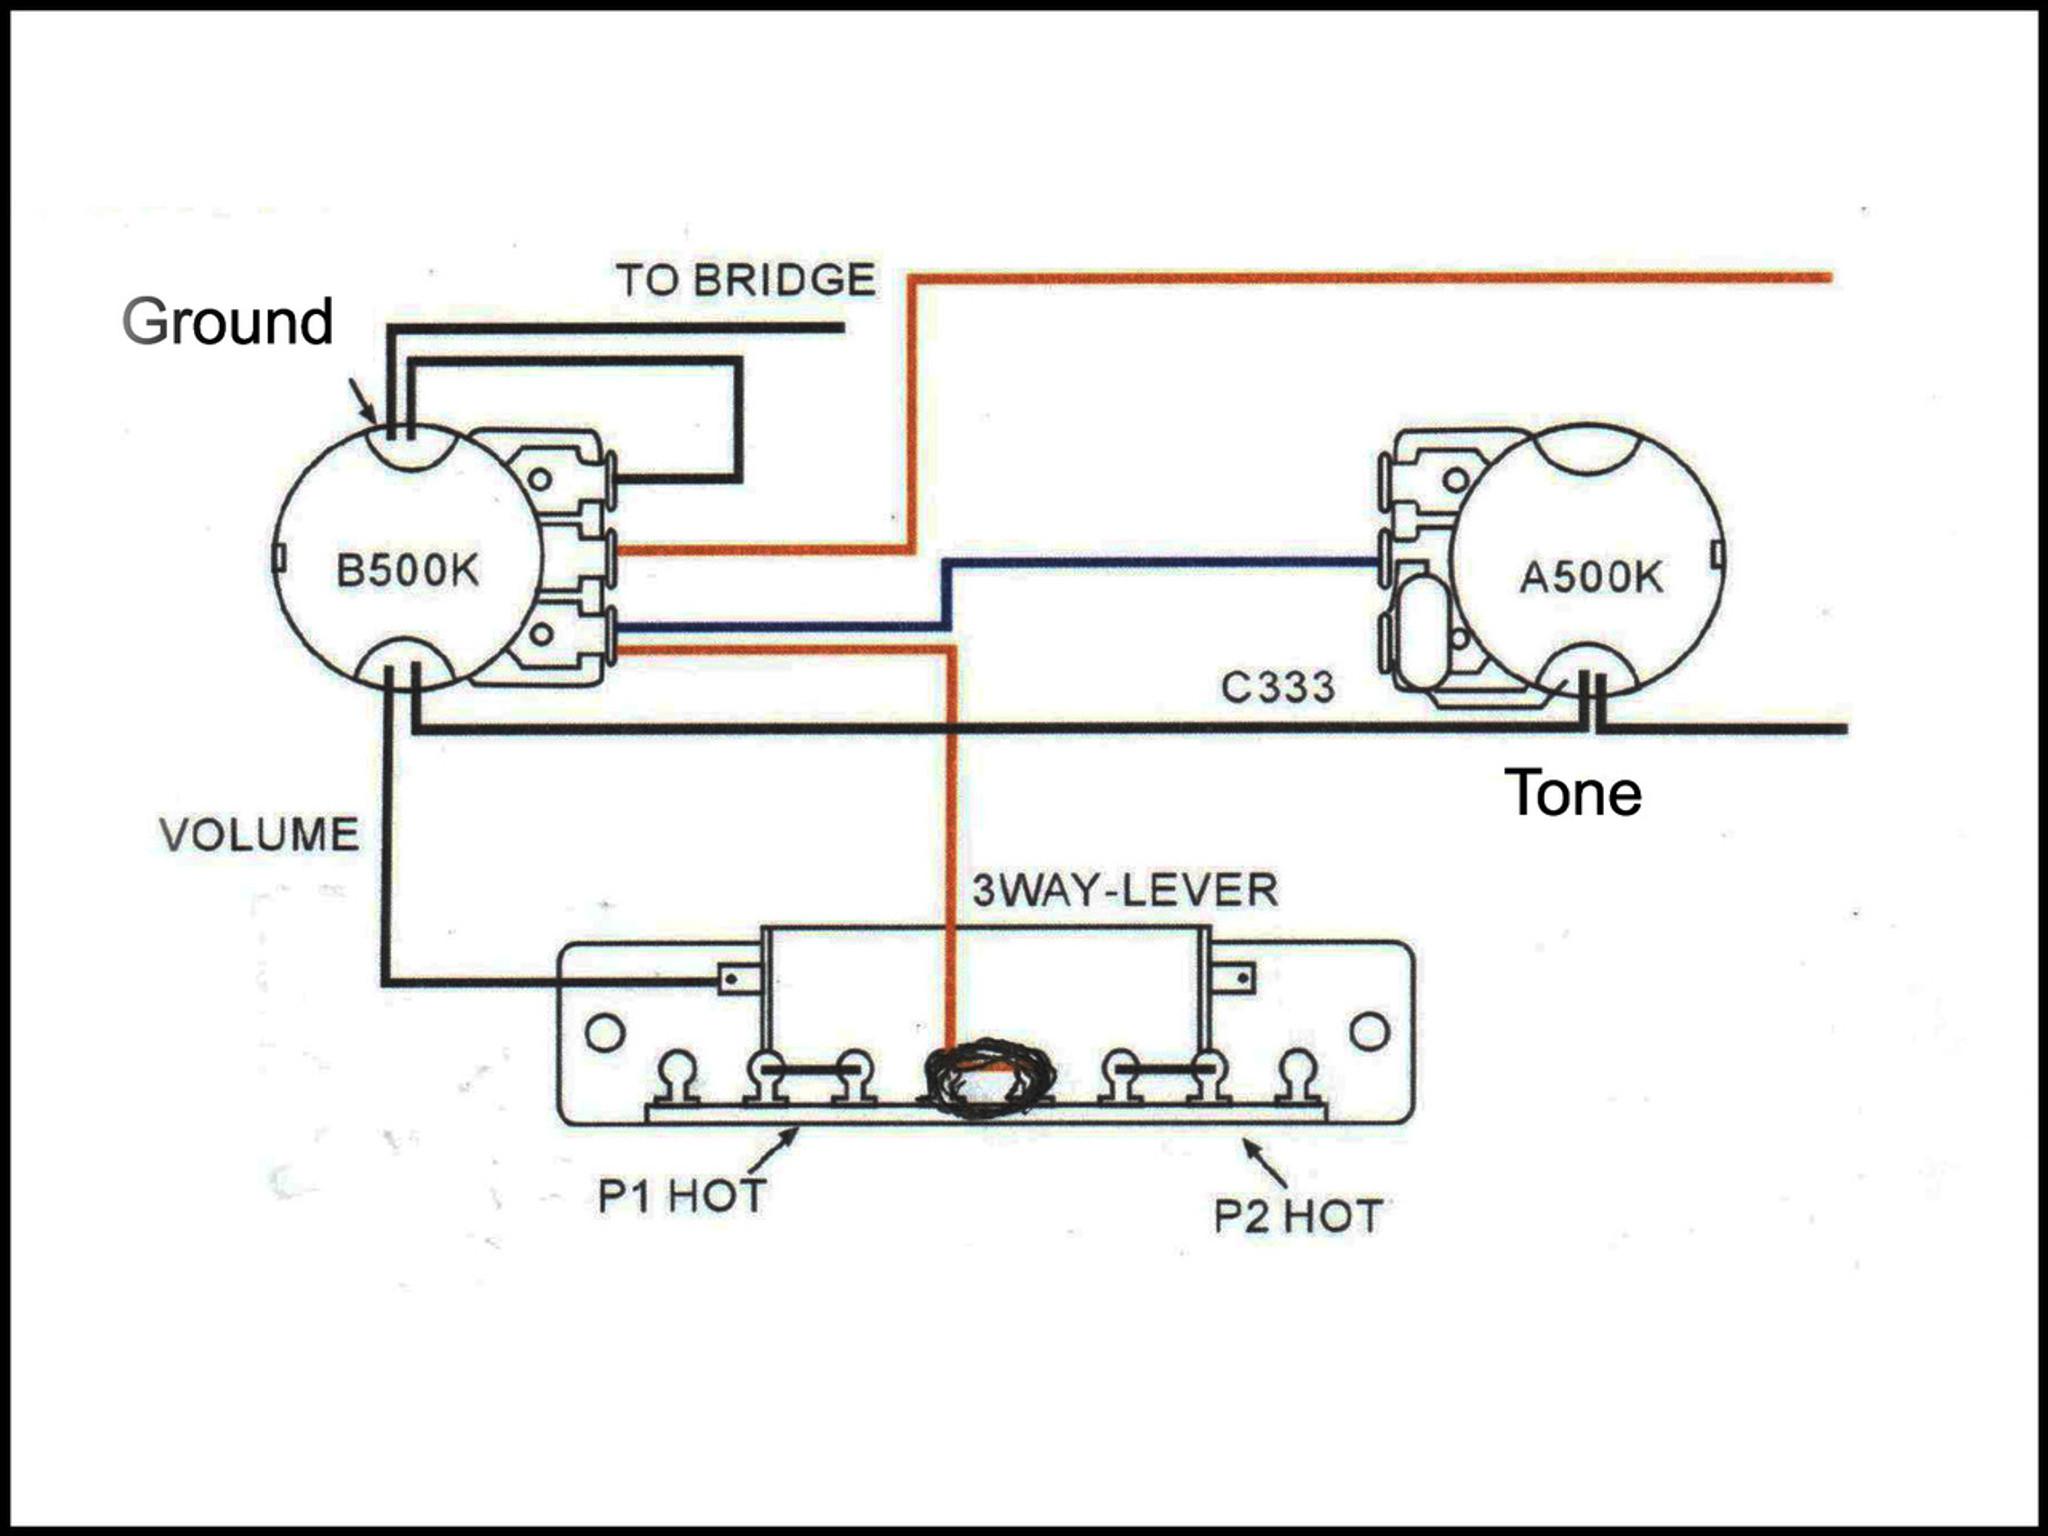 Comfortable Boiler Diagram Thin Guitar Toggle Switch Wiring Rectangular Vehicle Alarm Wiring Diagram 3 Coil Pickup Youthful Remote Start Alarm Installation GreenSolar System Diagram Basic 3 Way Guitar Pickup Toggle Switch   C. B